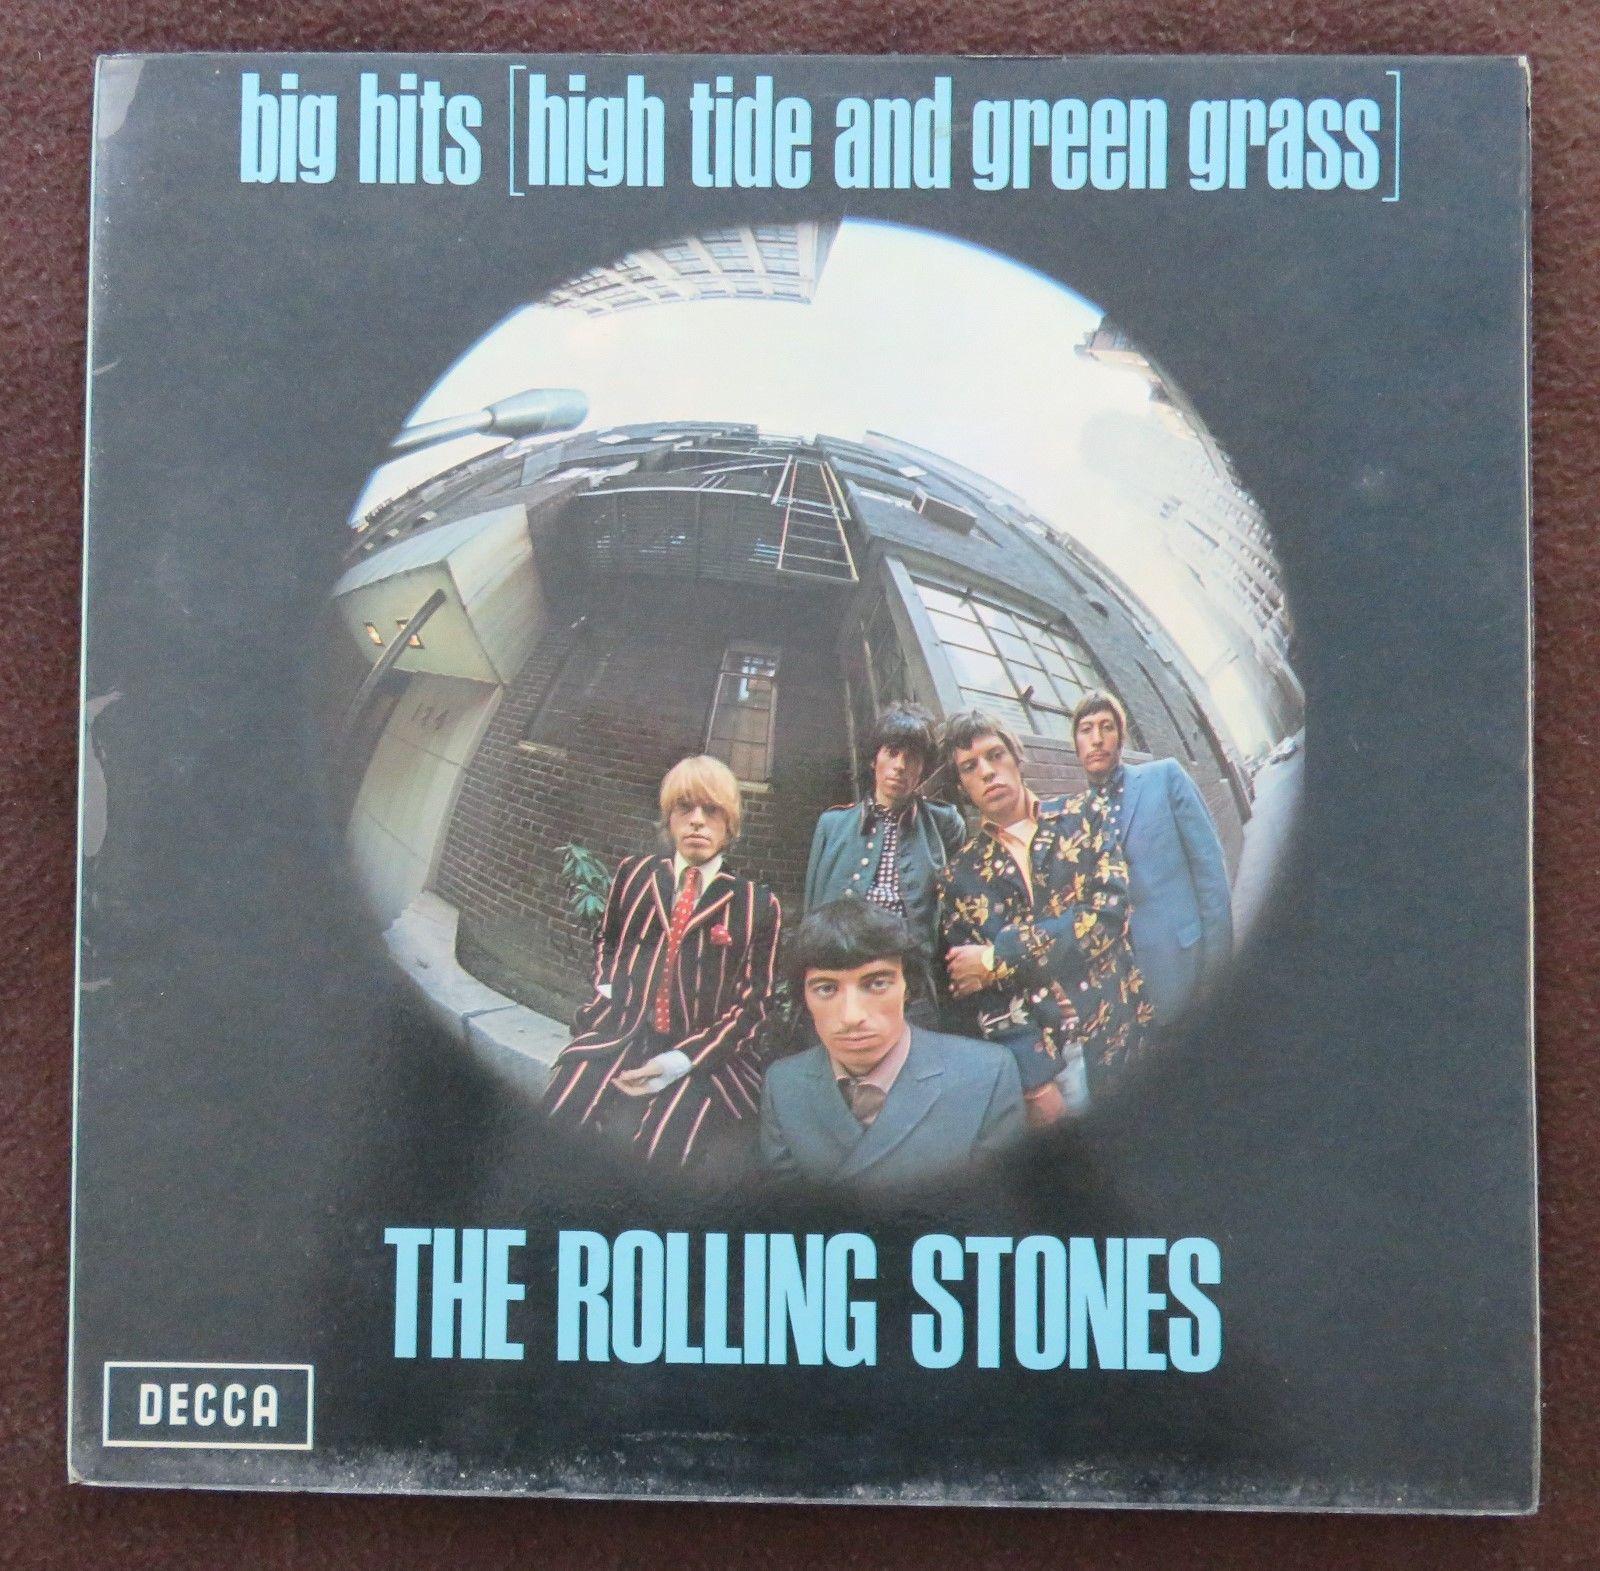 Rolling Stones LP Big Hits High Tide And Green Grass 1966 Decca TXS 101 Mint